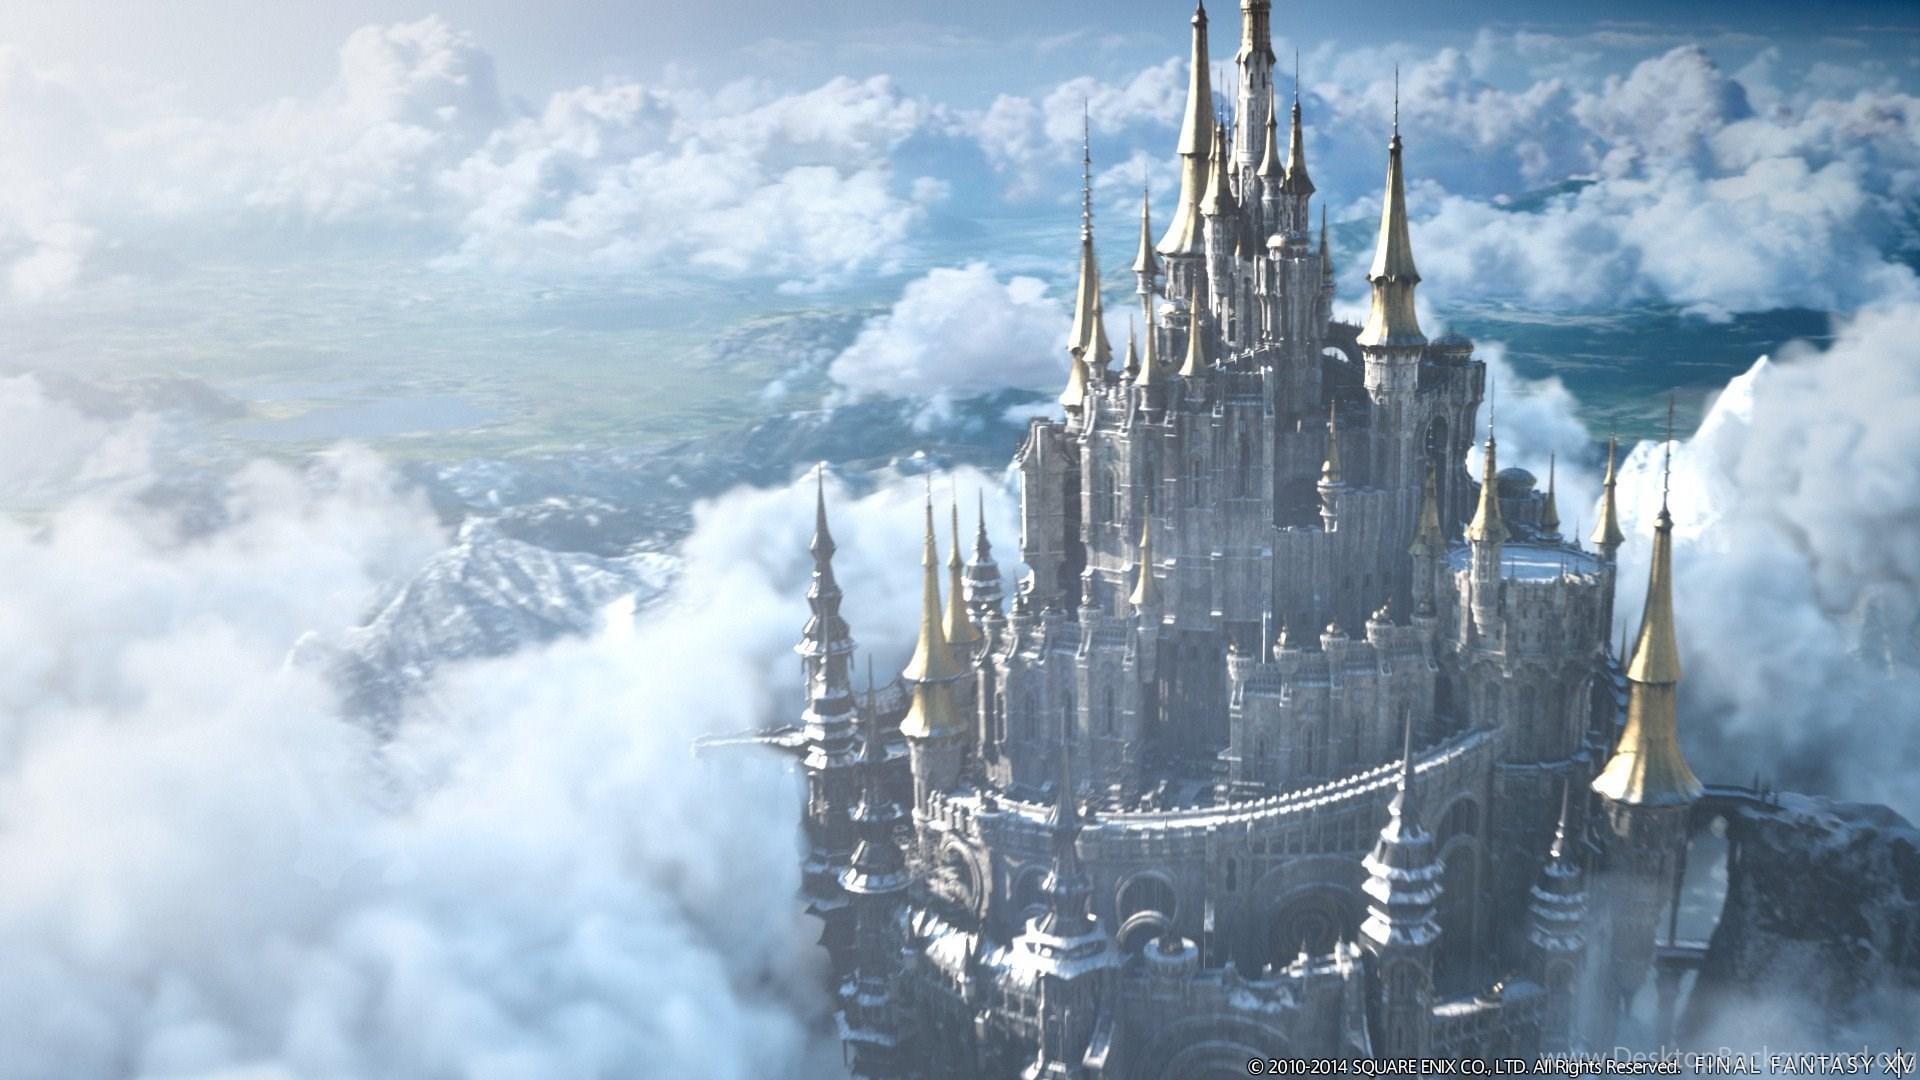 Final Fantasy Xiv Heavensward Hd Wallpapers 5 Classywallpapers